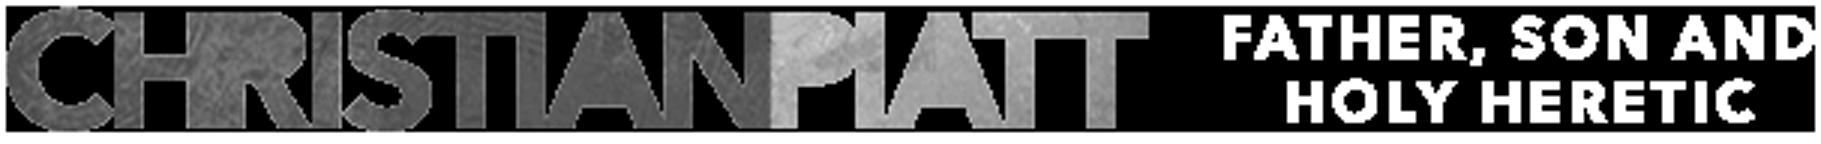 christianpiatt-theme-logo.png